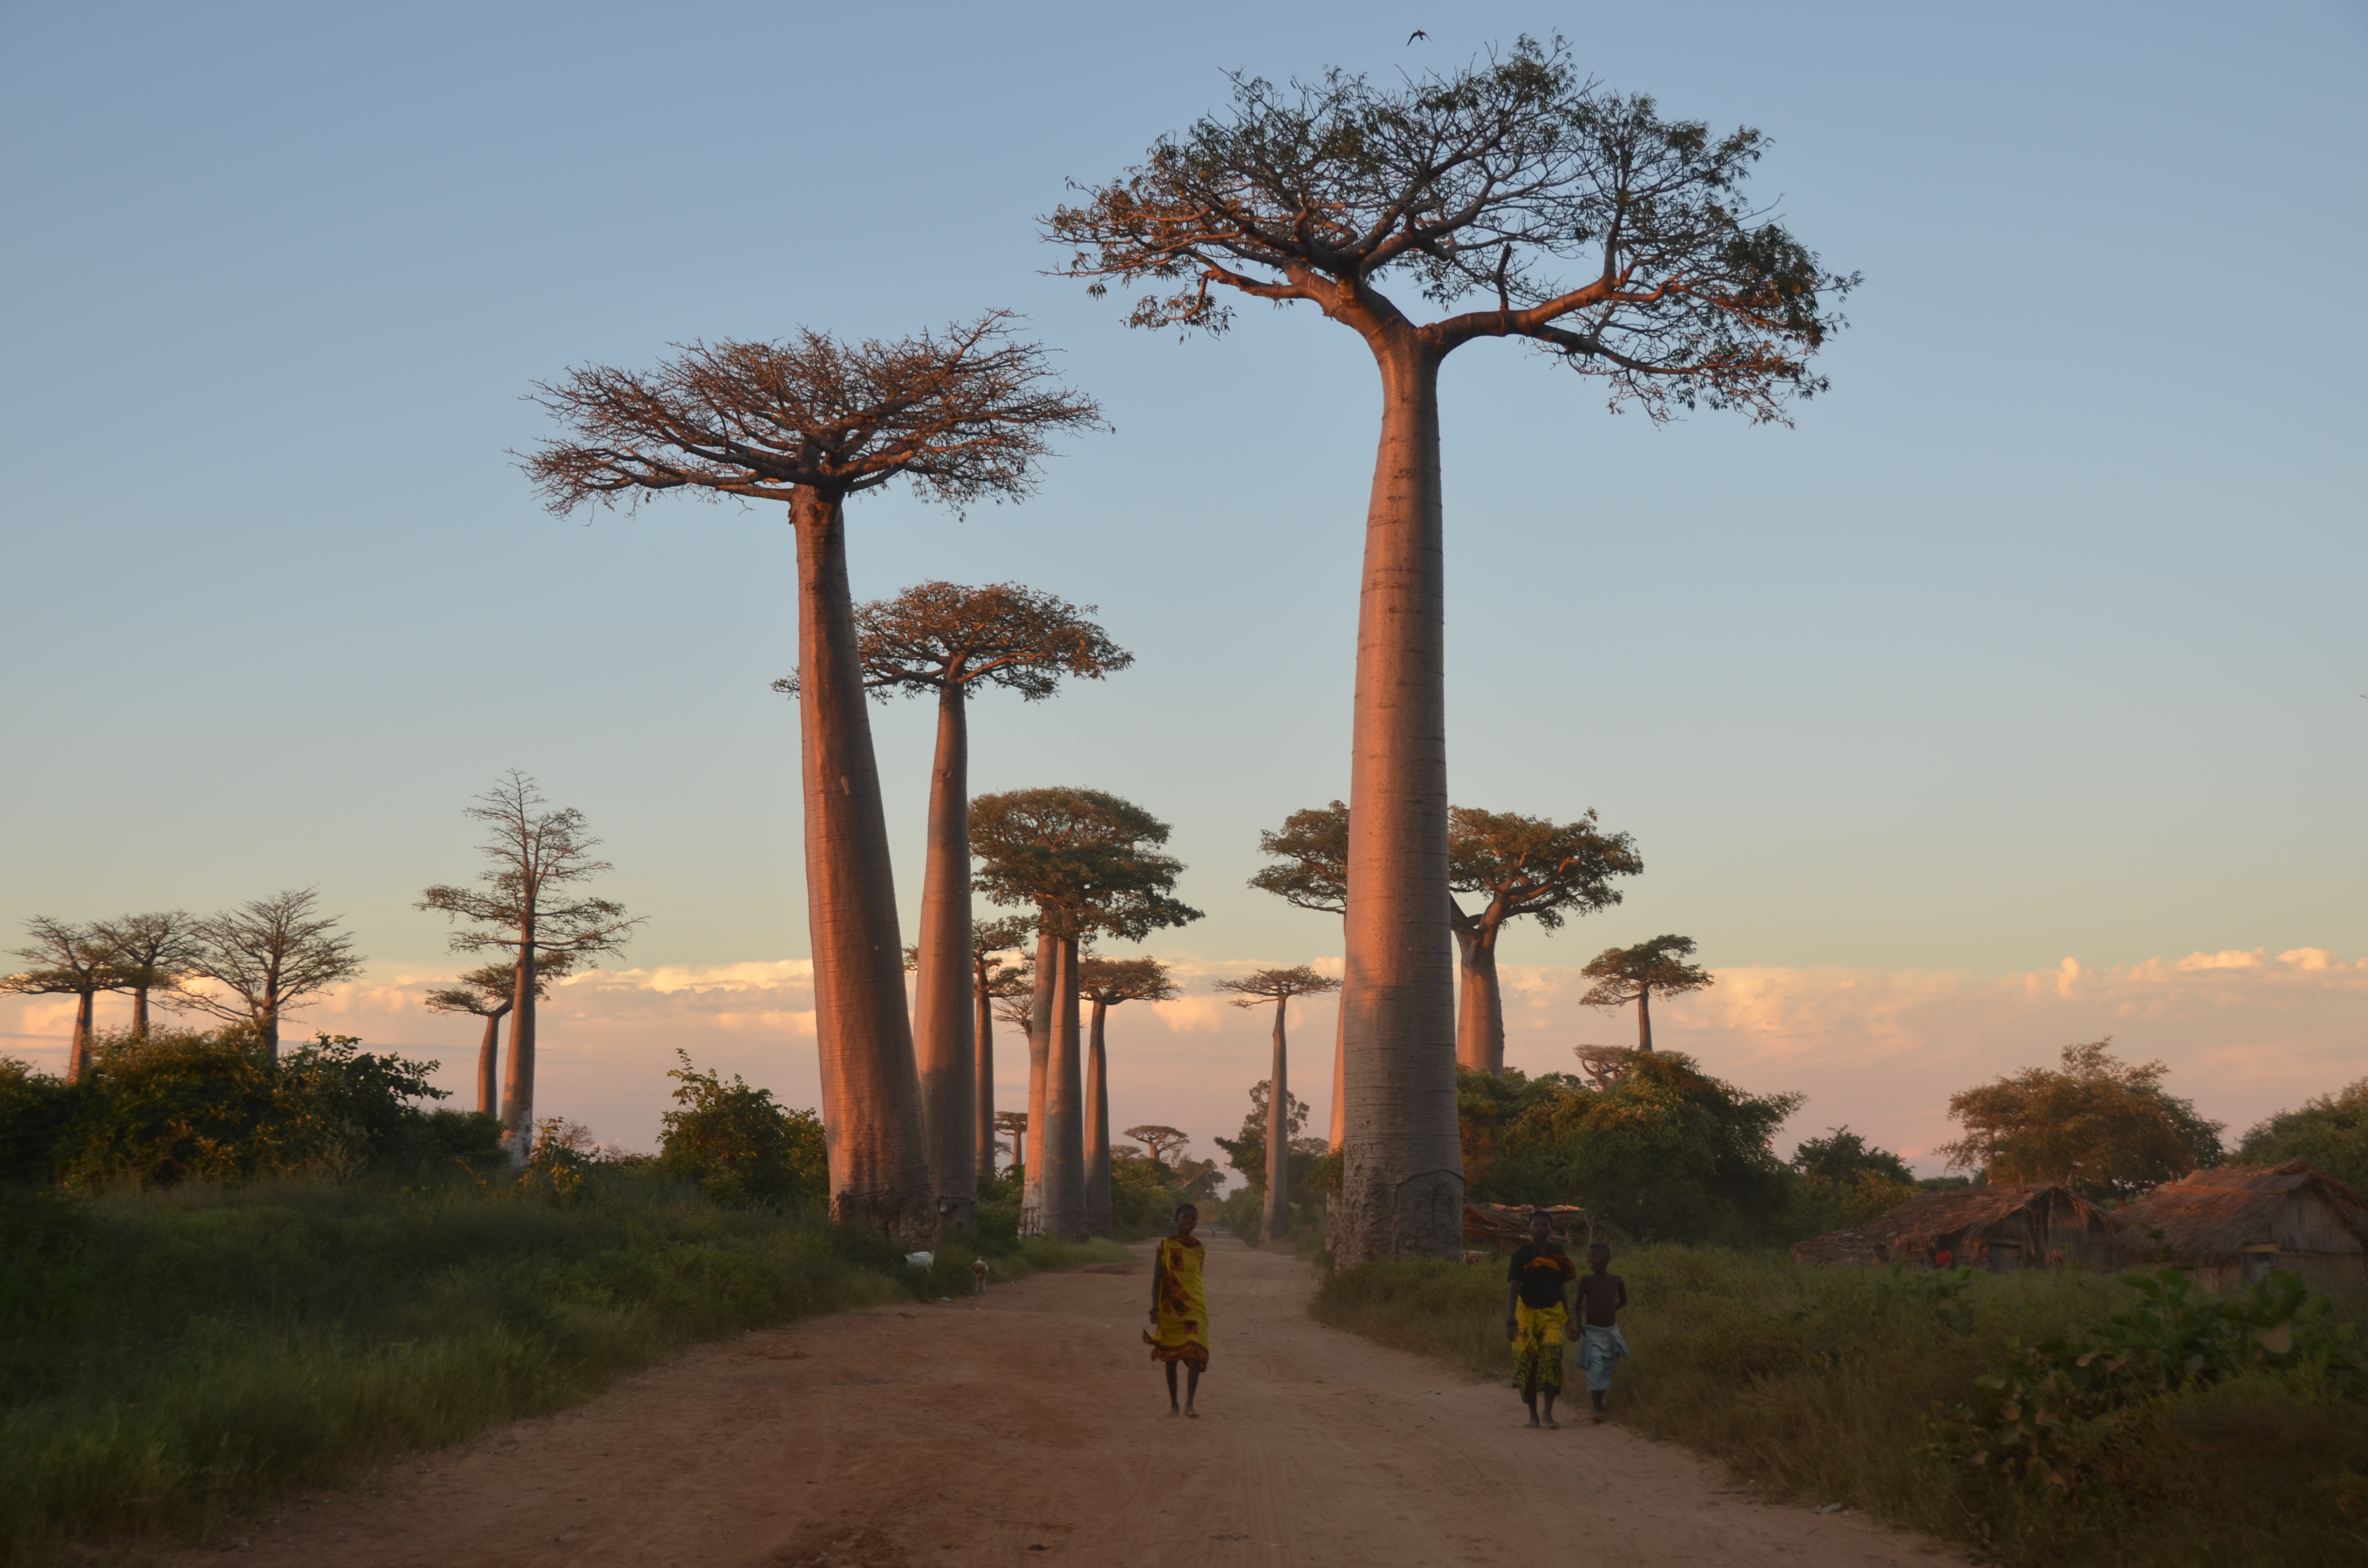 Madagascar: A Gemologist's Journey